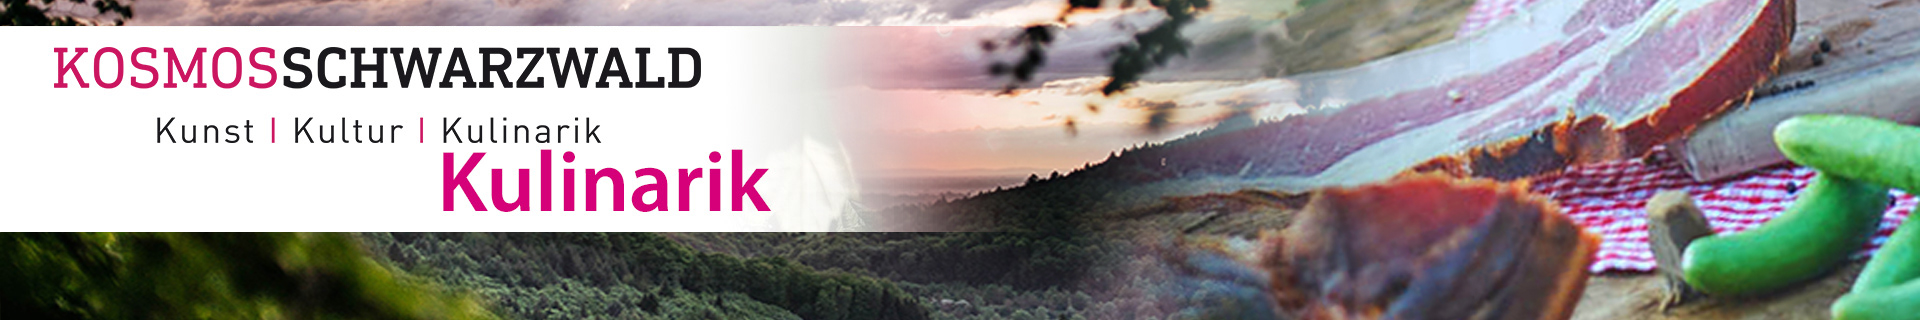 KS-kulinarik-landscape